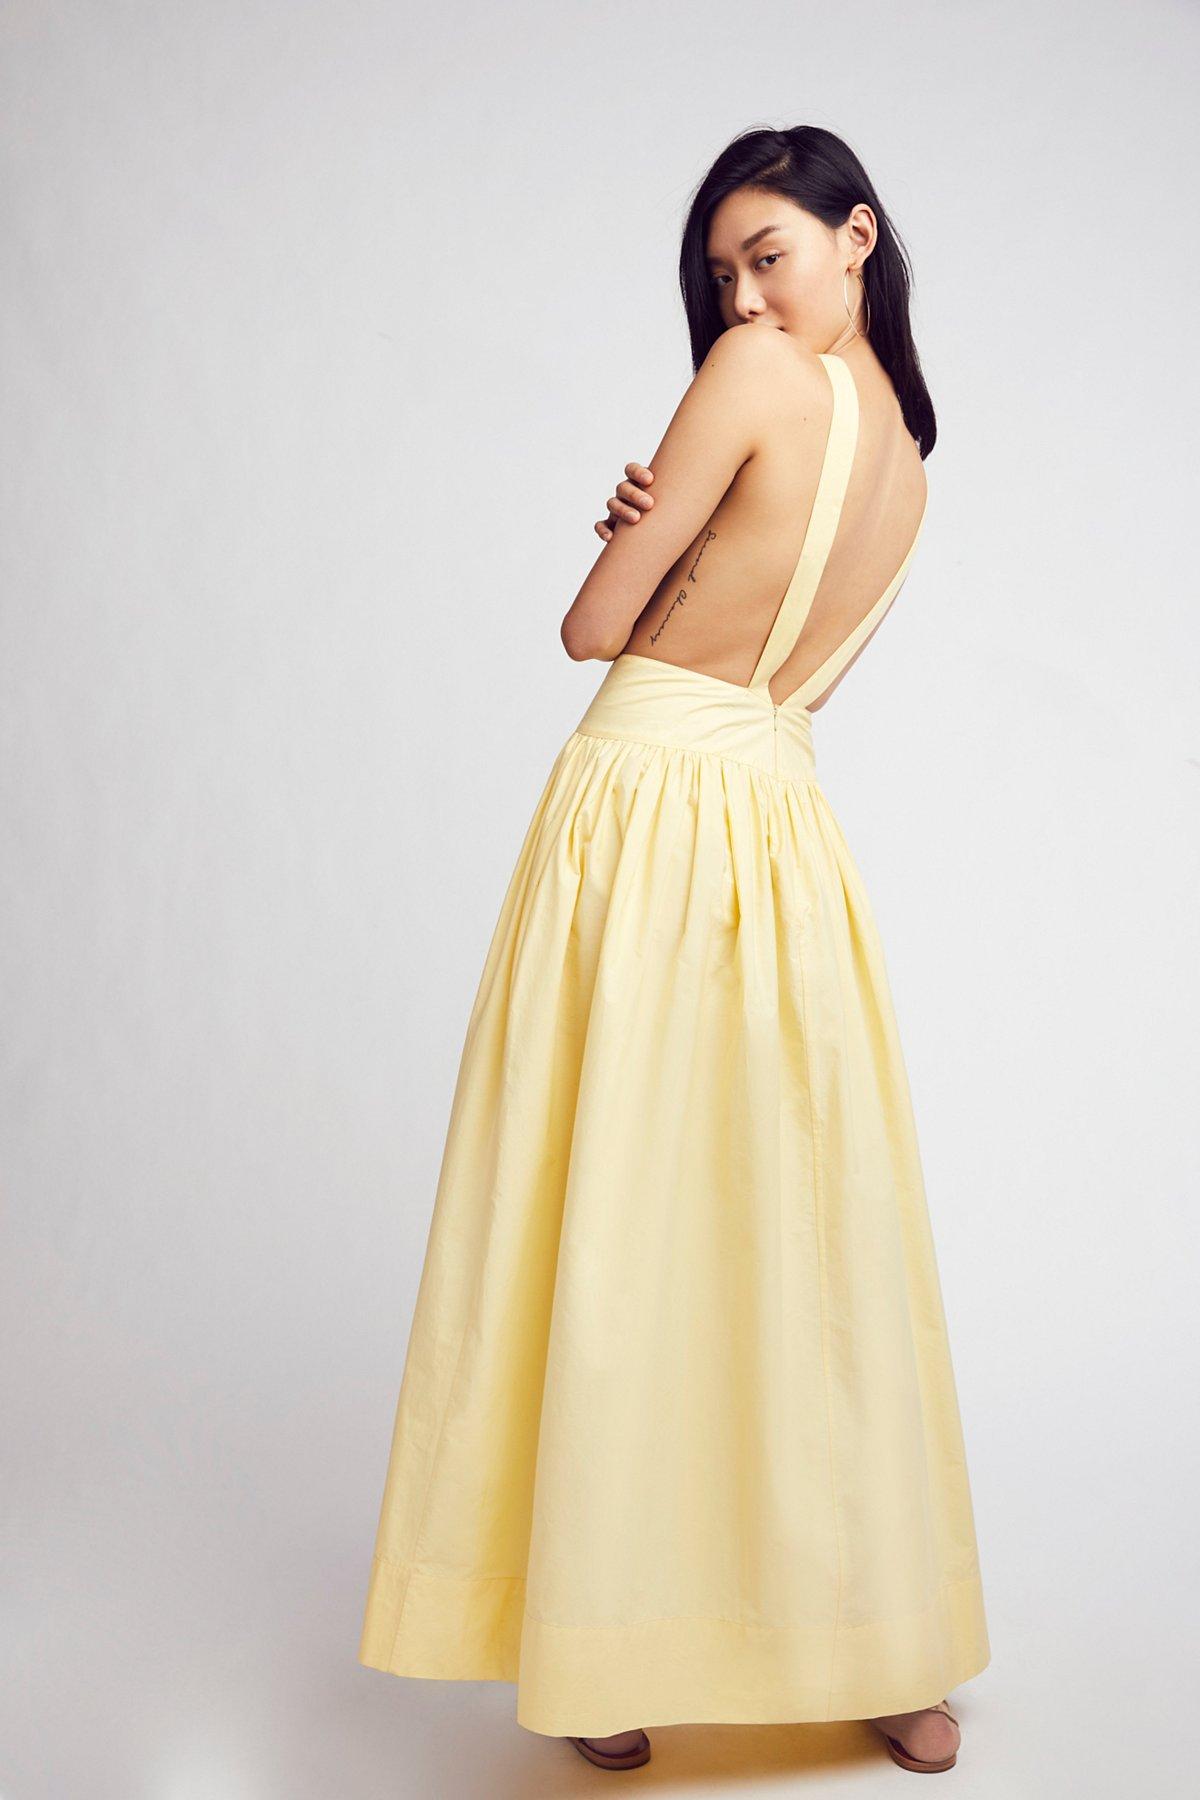 Zephyr Pinafore Dress